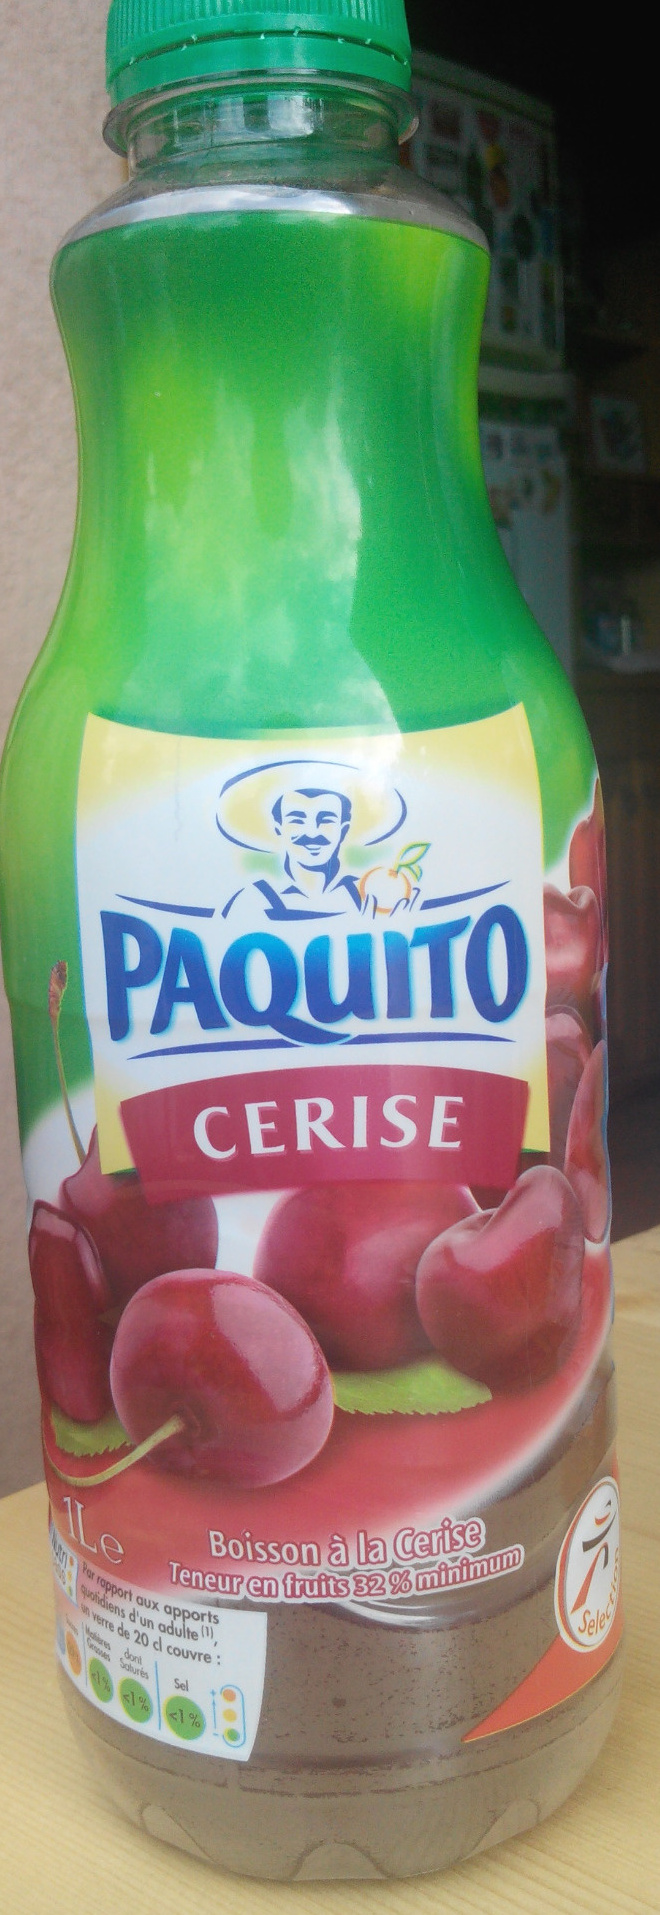 Paquito cerise - Product